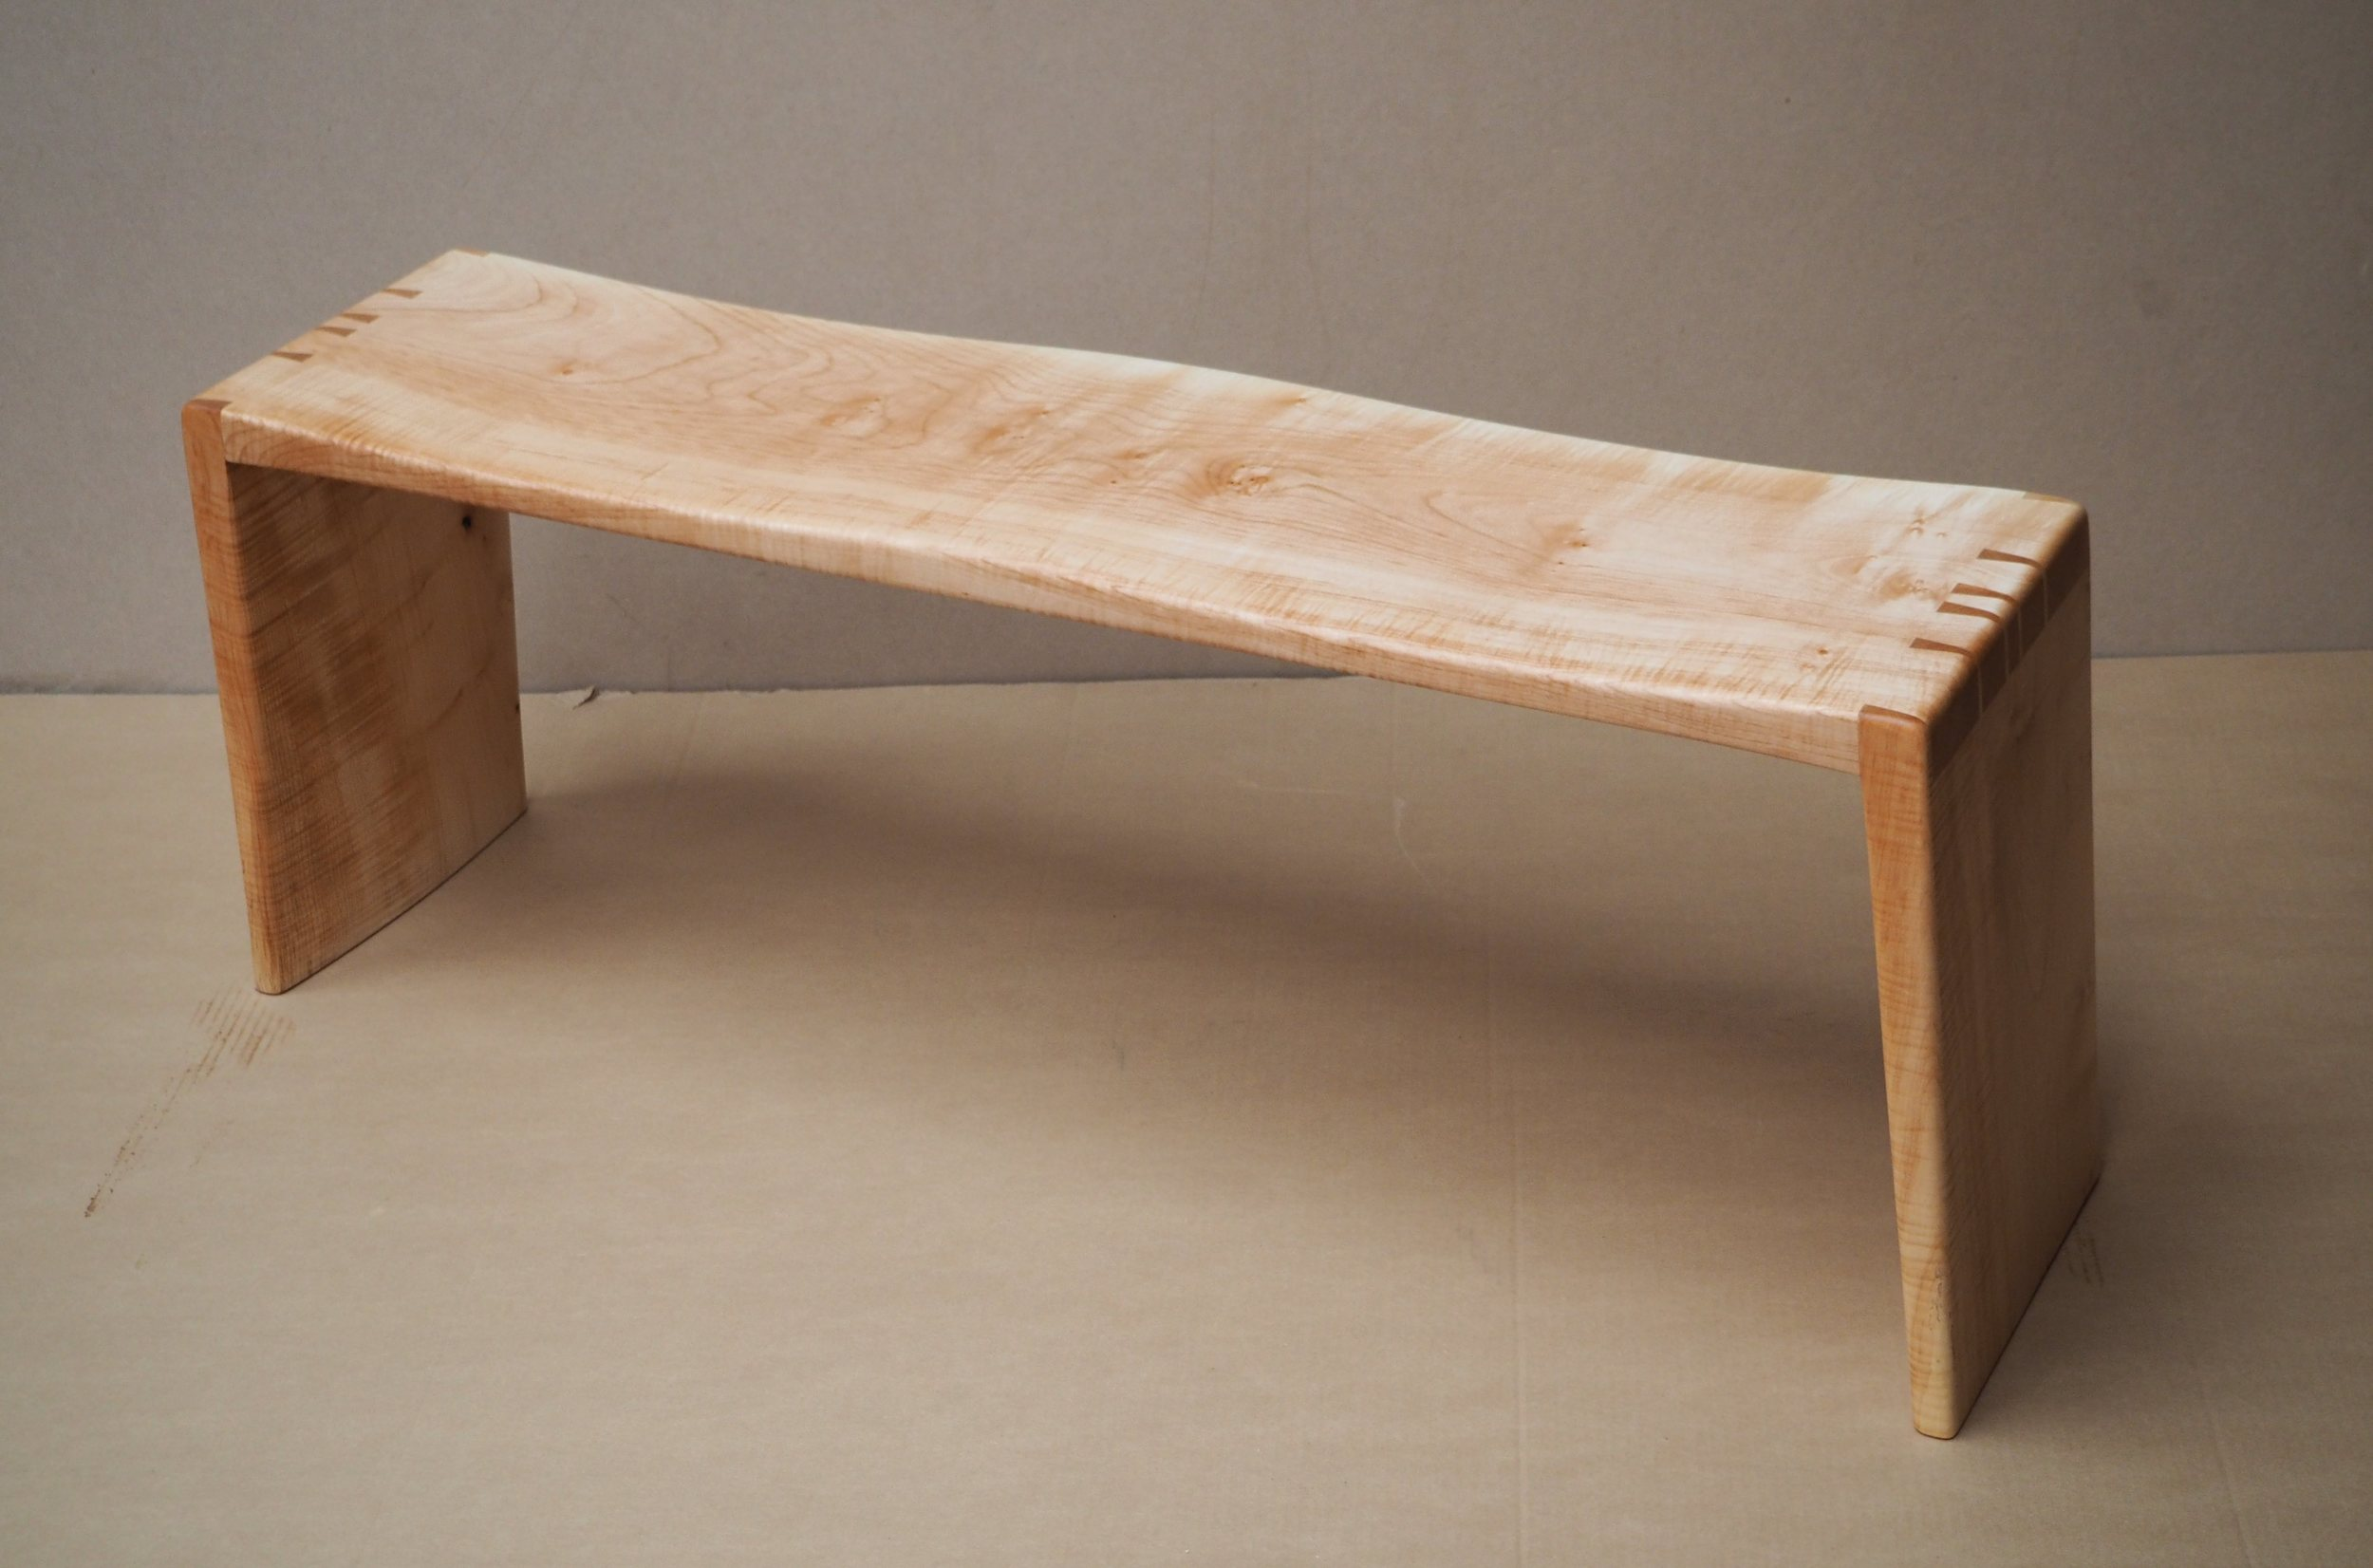 Maple Bench Seat2 copy.jpg